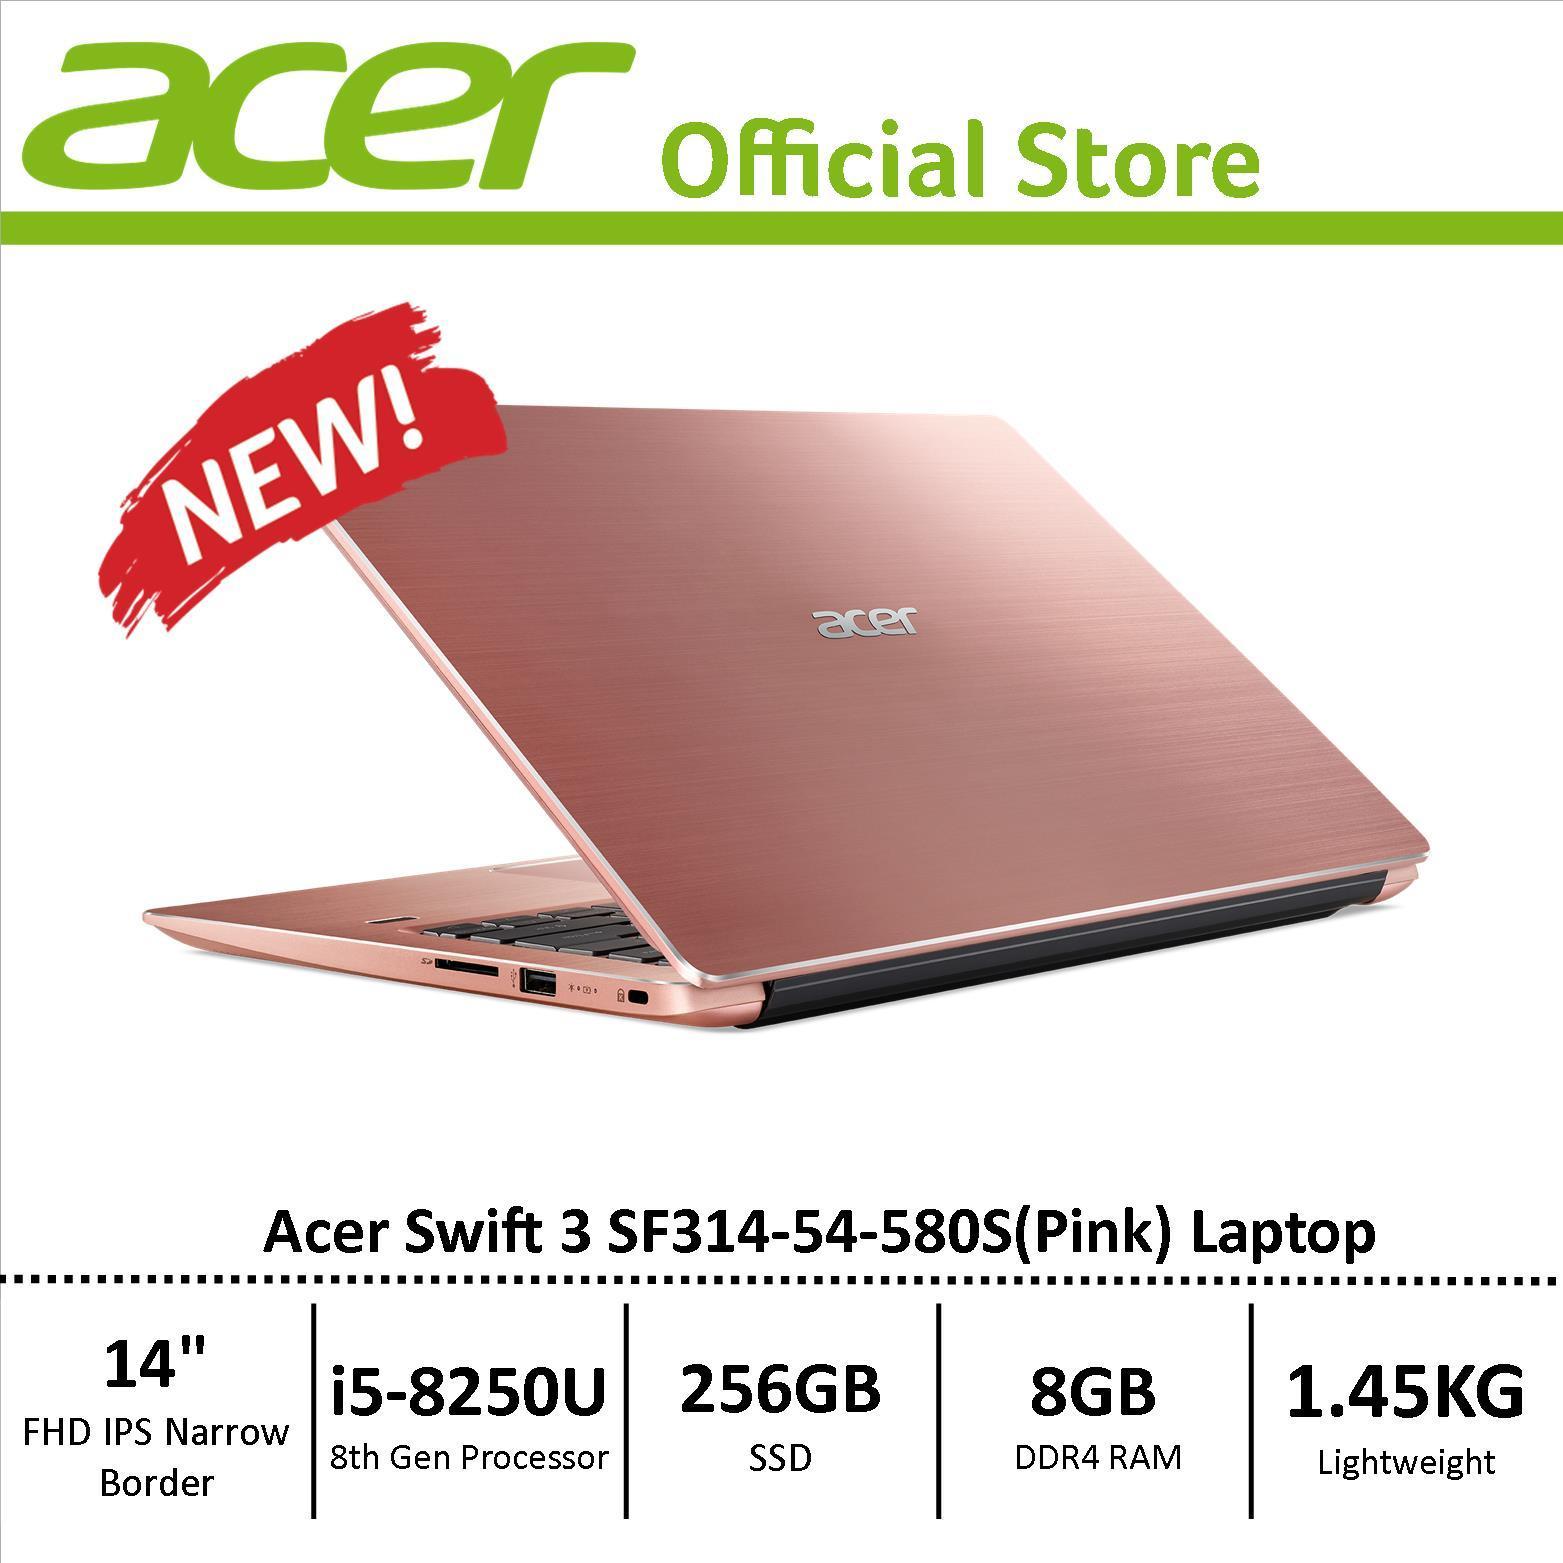 Acer Swift 3 SF314-54 Thin and Light Narrow Border Design Laptop - 8th Generation i5 Processor